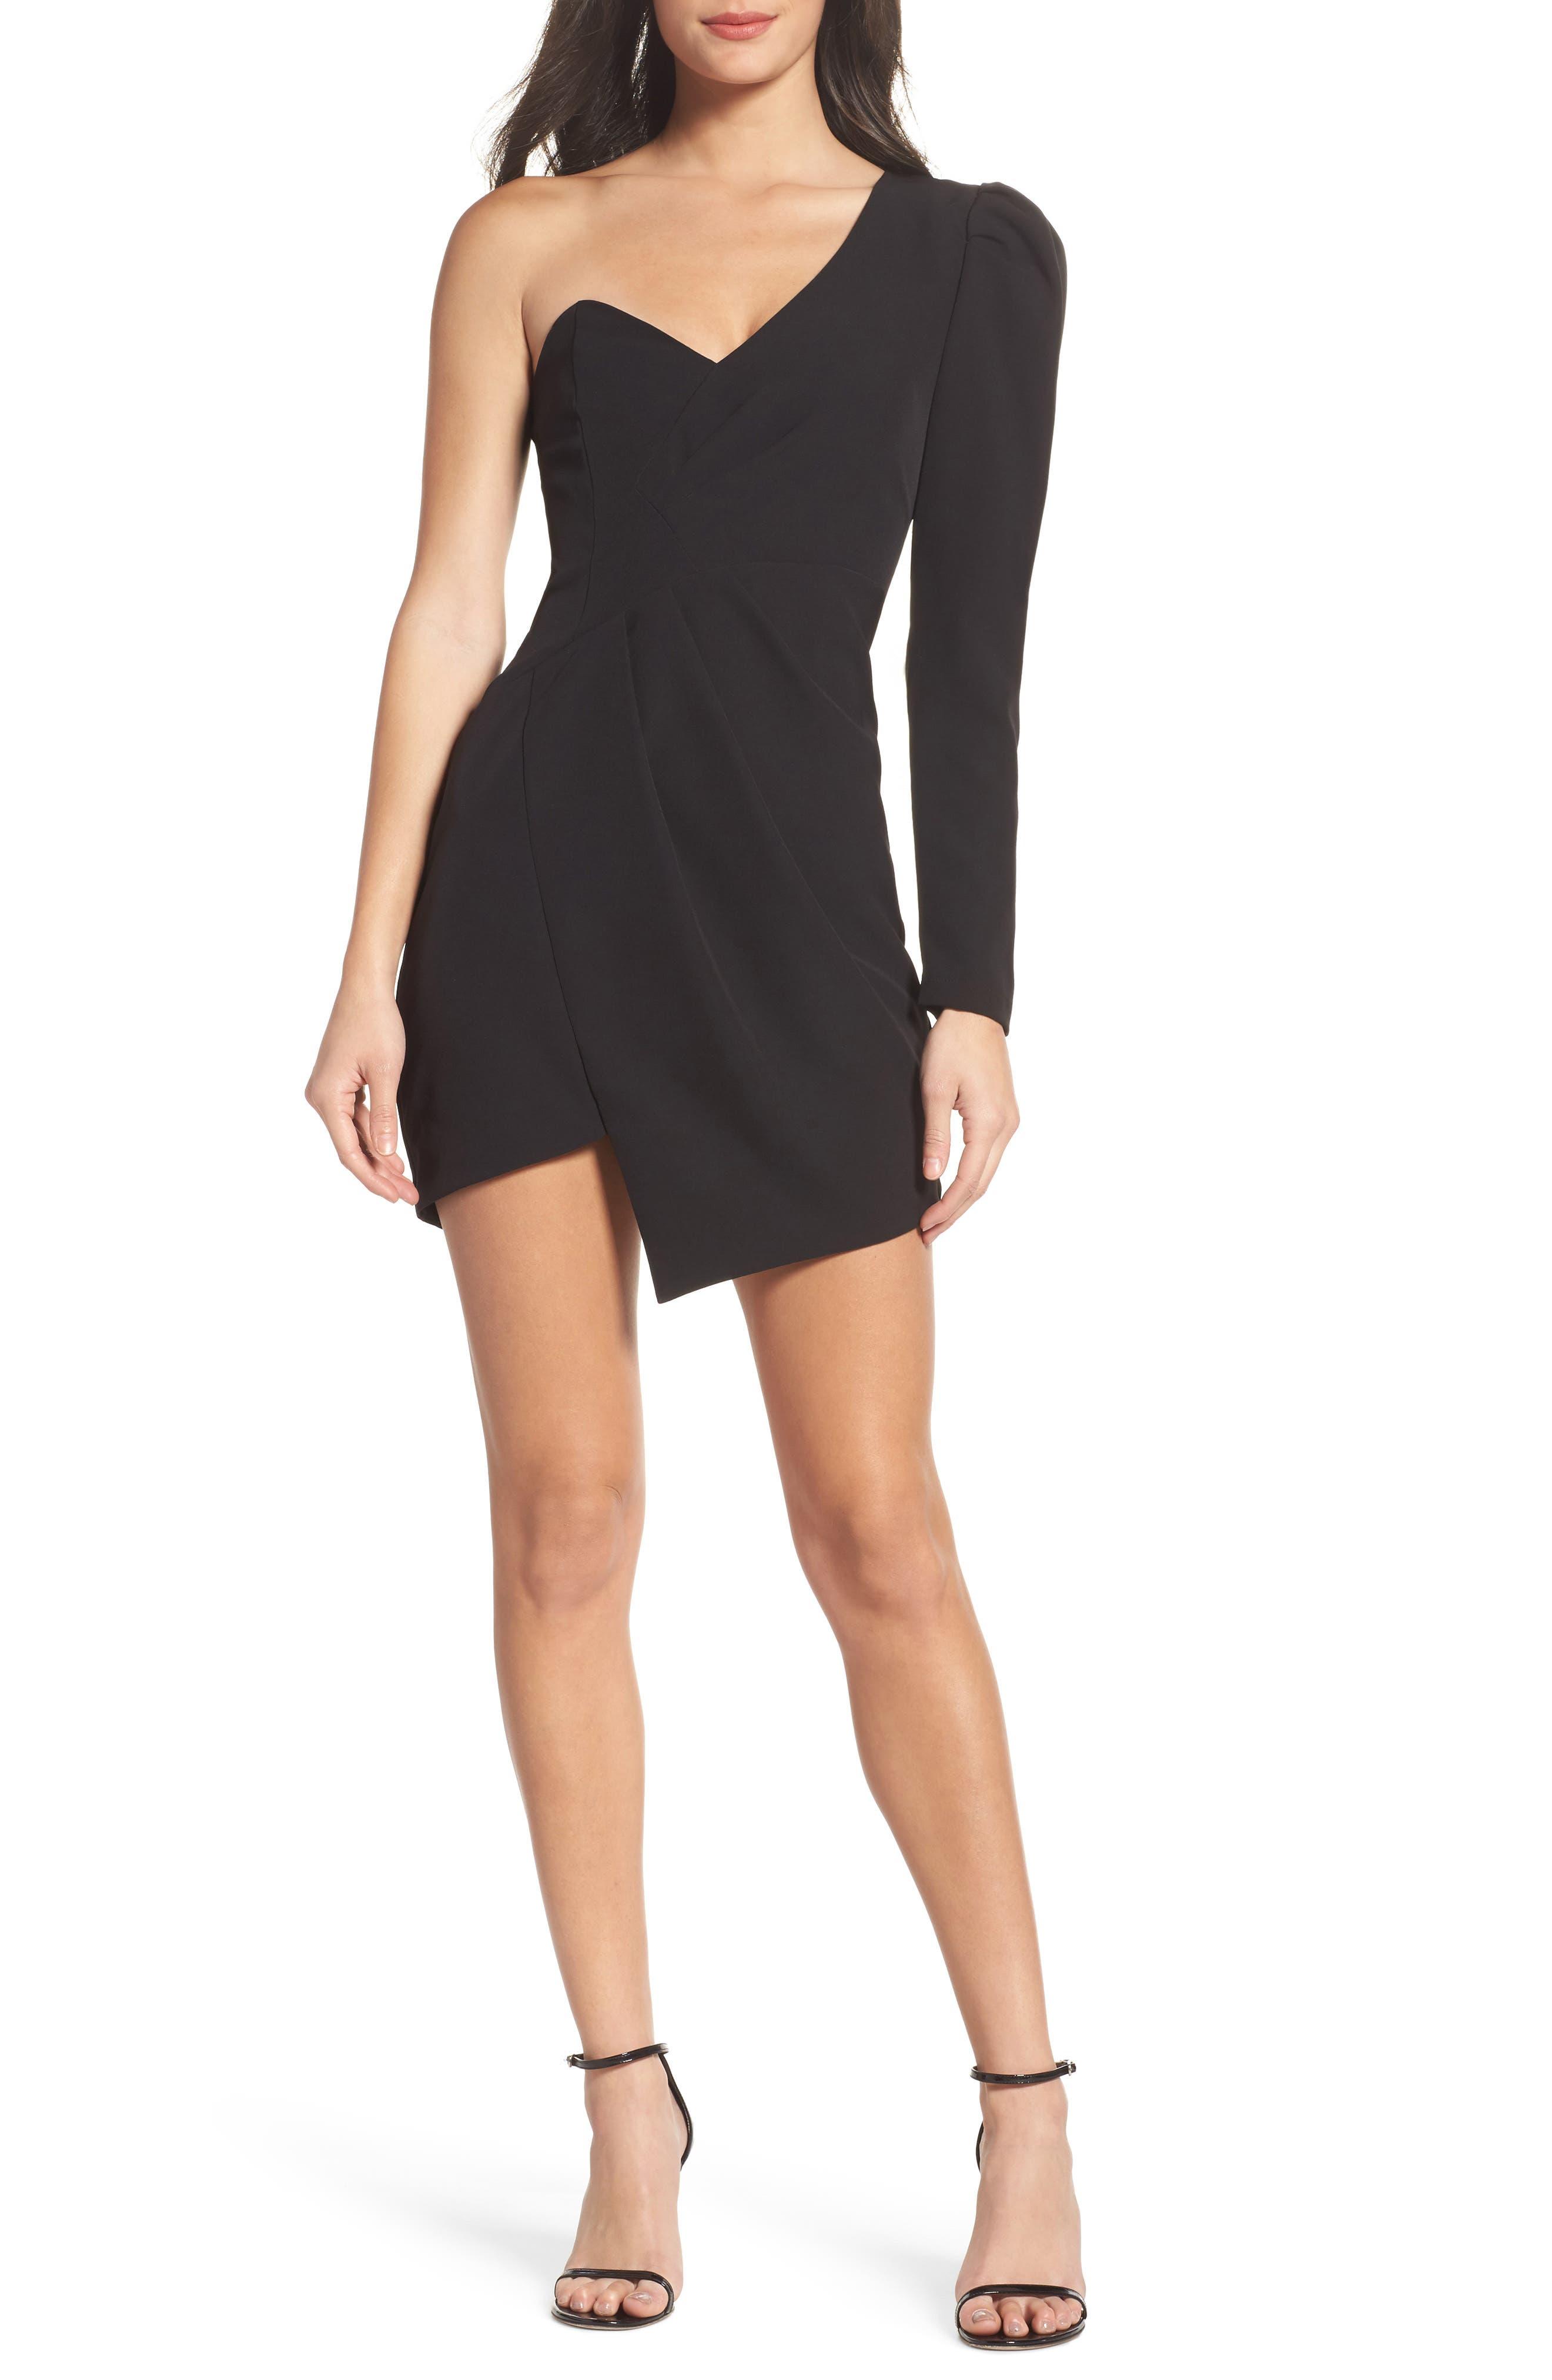 Alternate Image 1 Selected - Bardot Anja One-Shoulder Sheath Dress